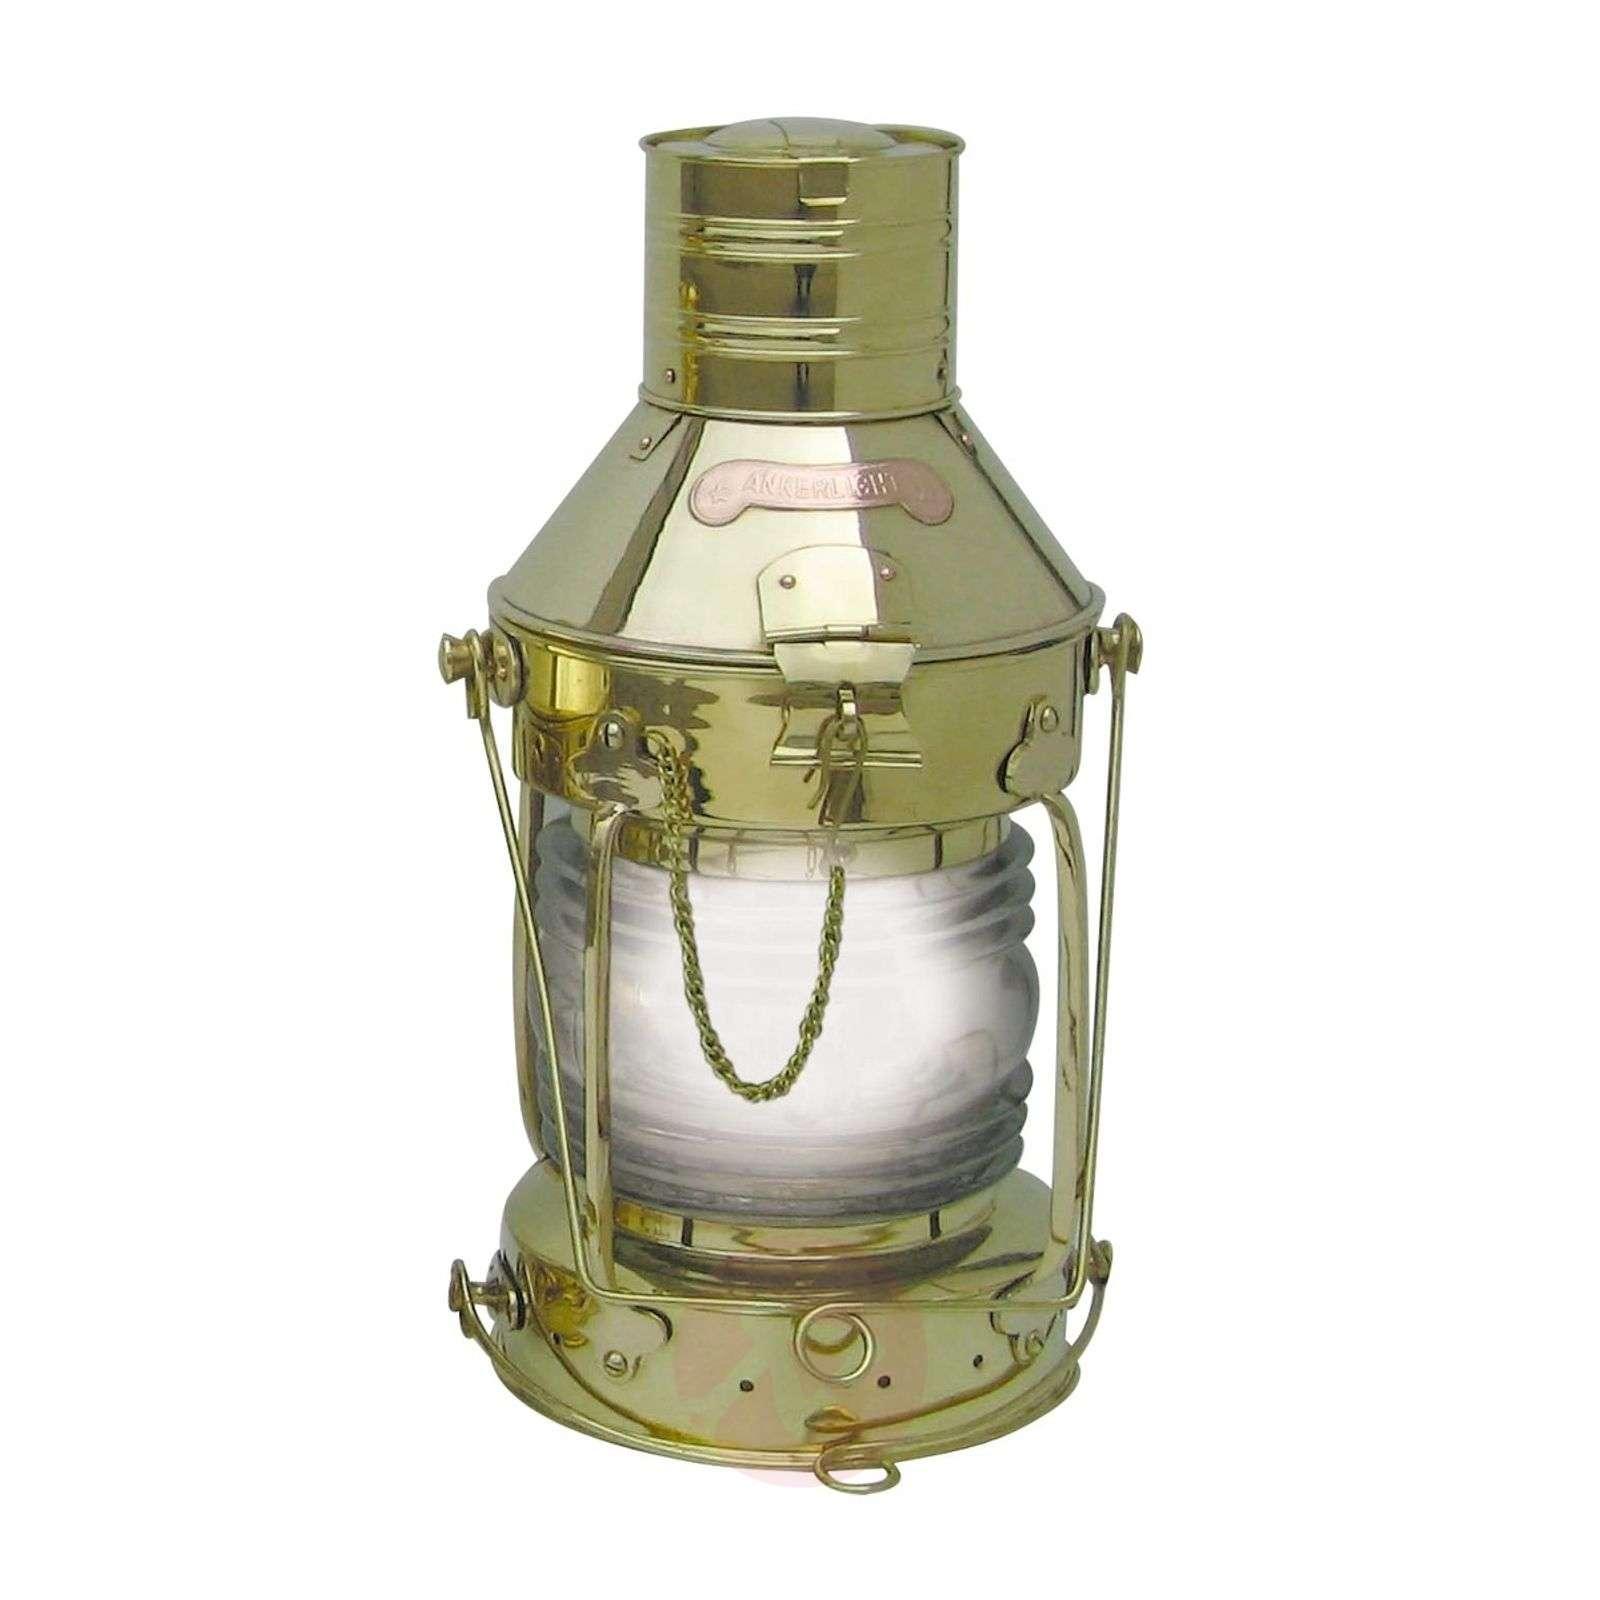 Electric decorative light Anker-8553039X-01